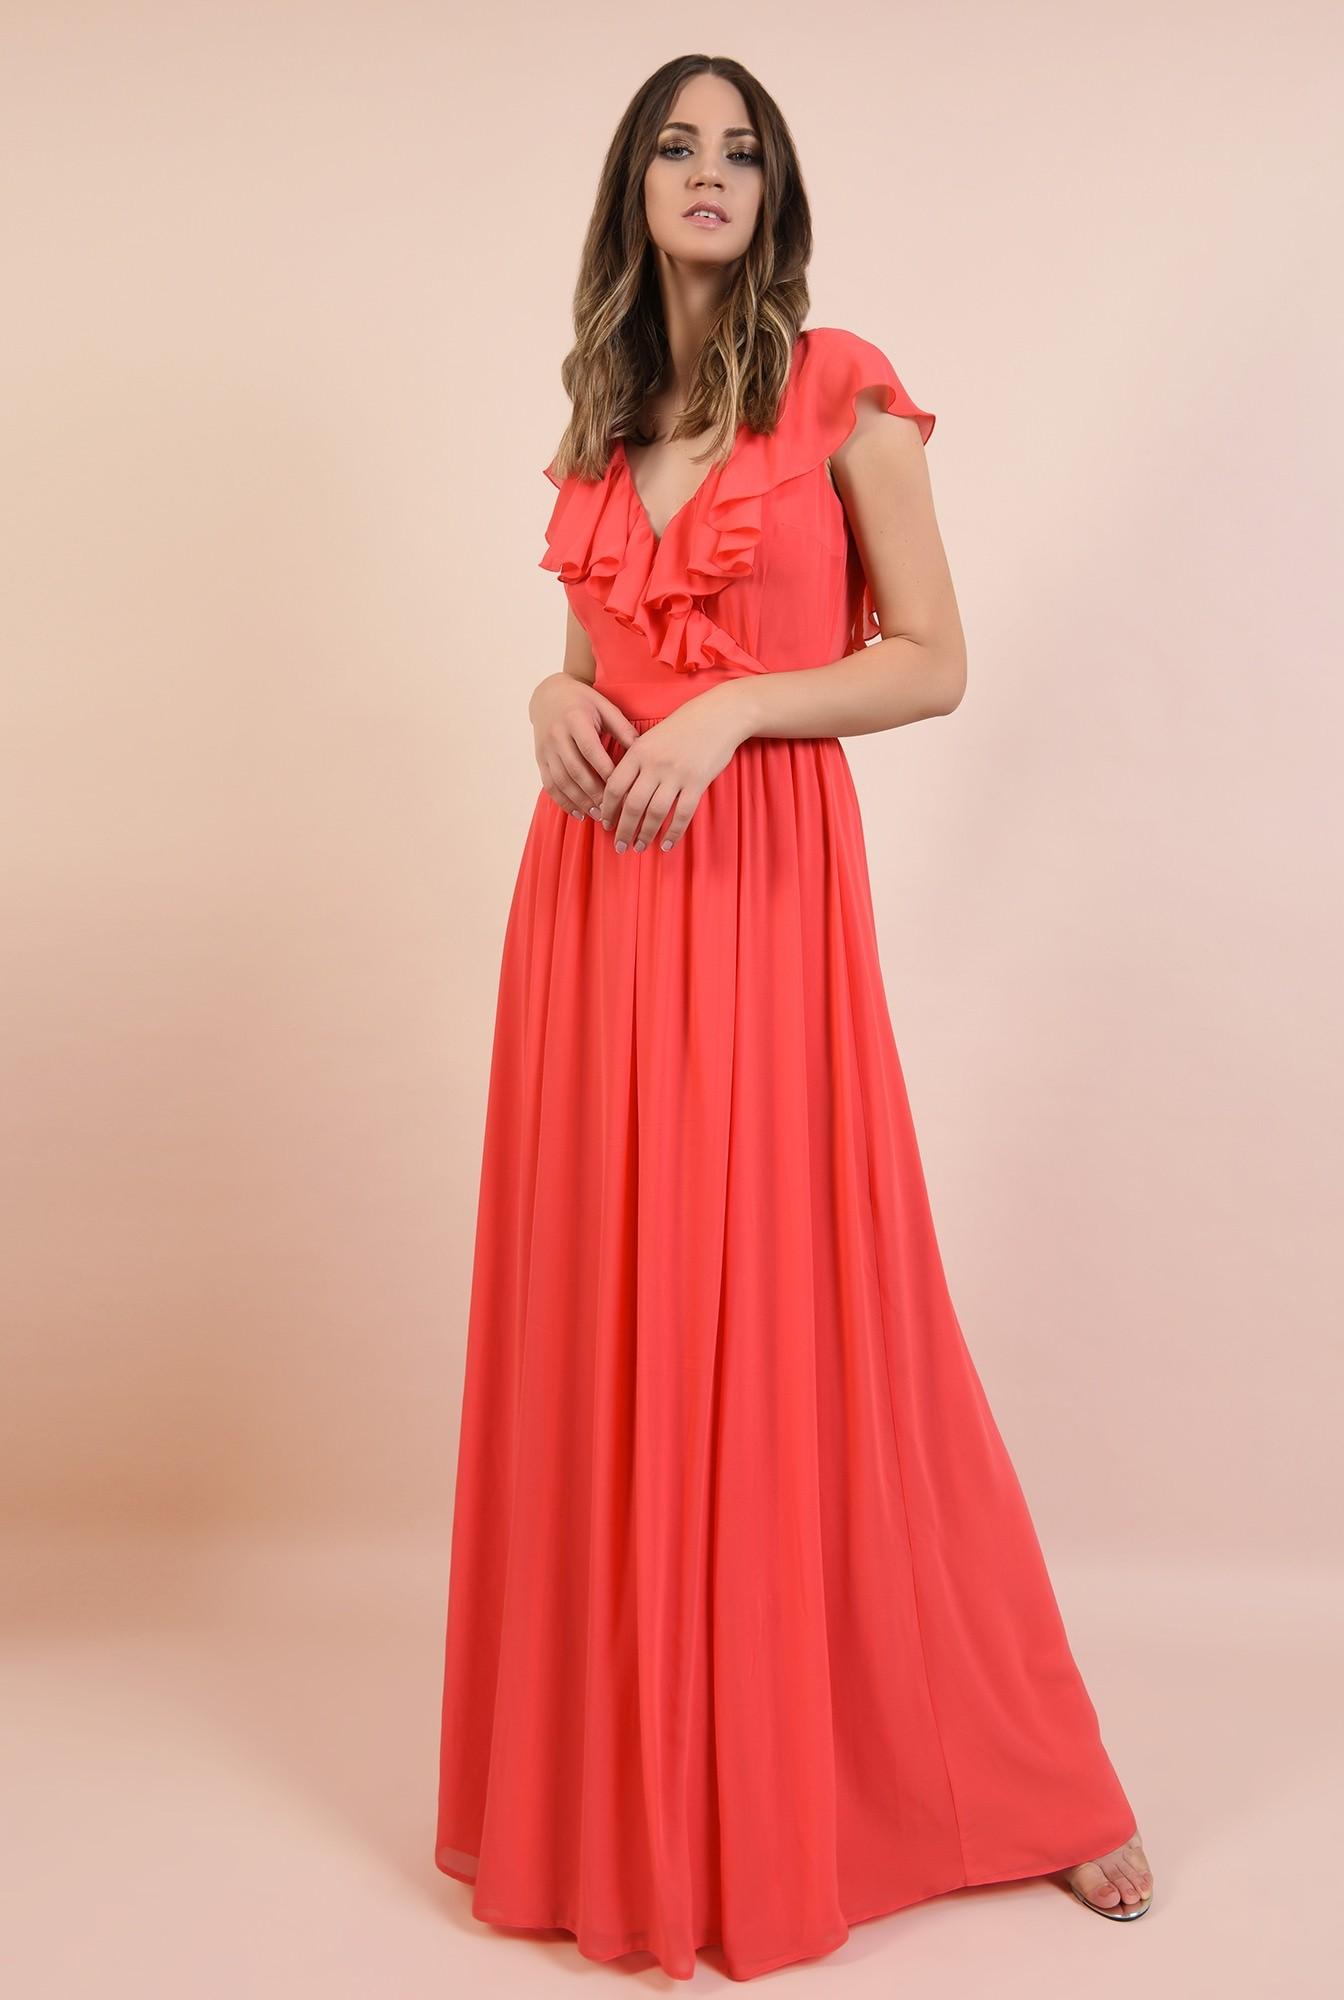 0 - 360 - rochie eleganta, lunga, evazata, cu anchior, cu volane, Poema